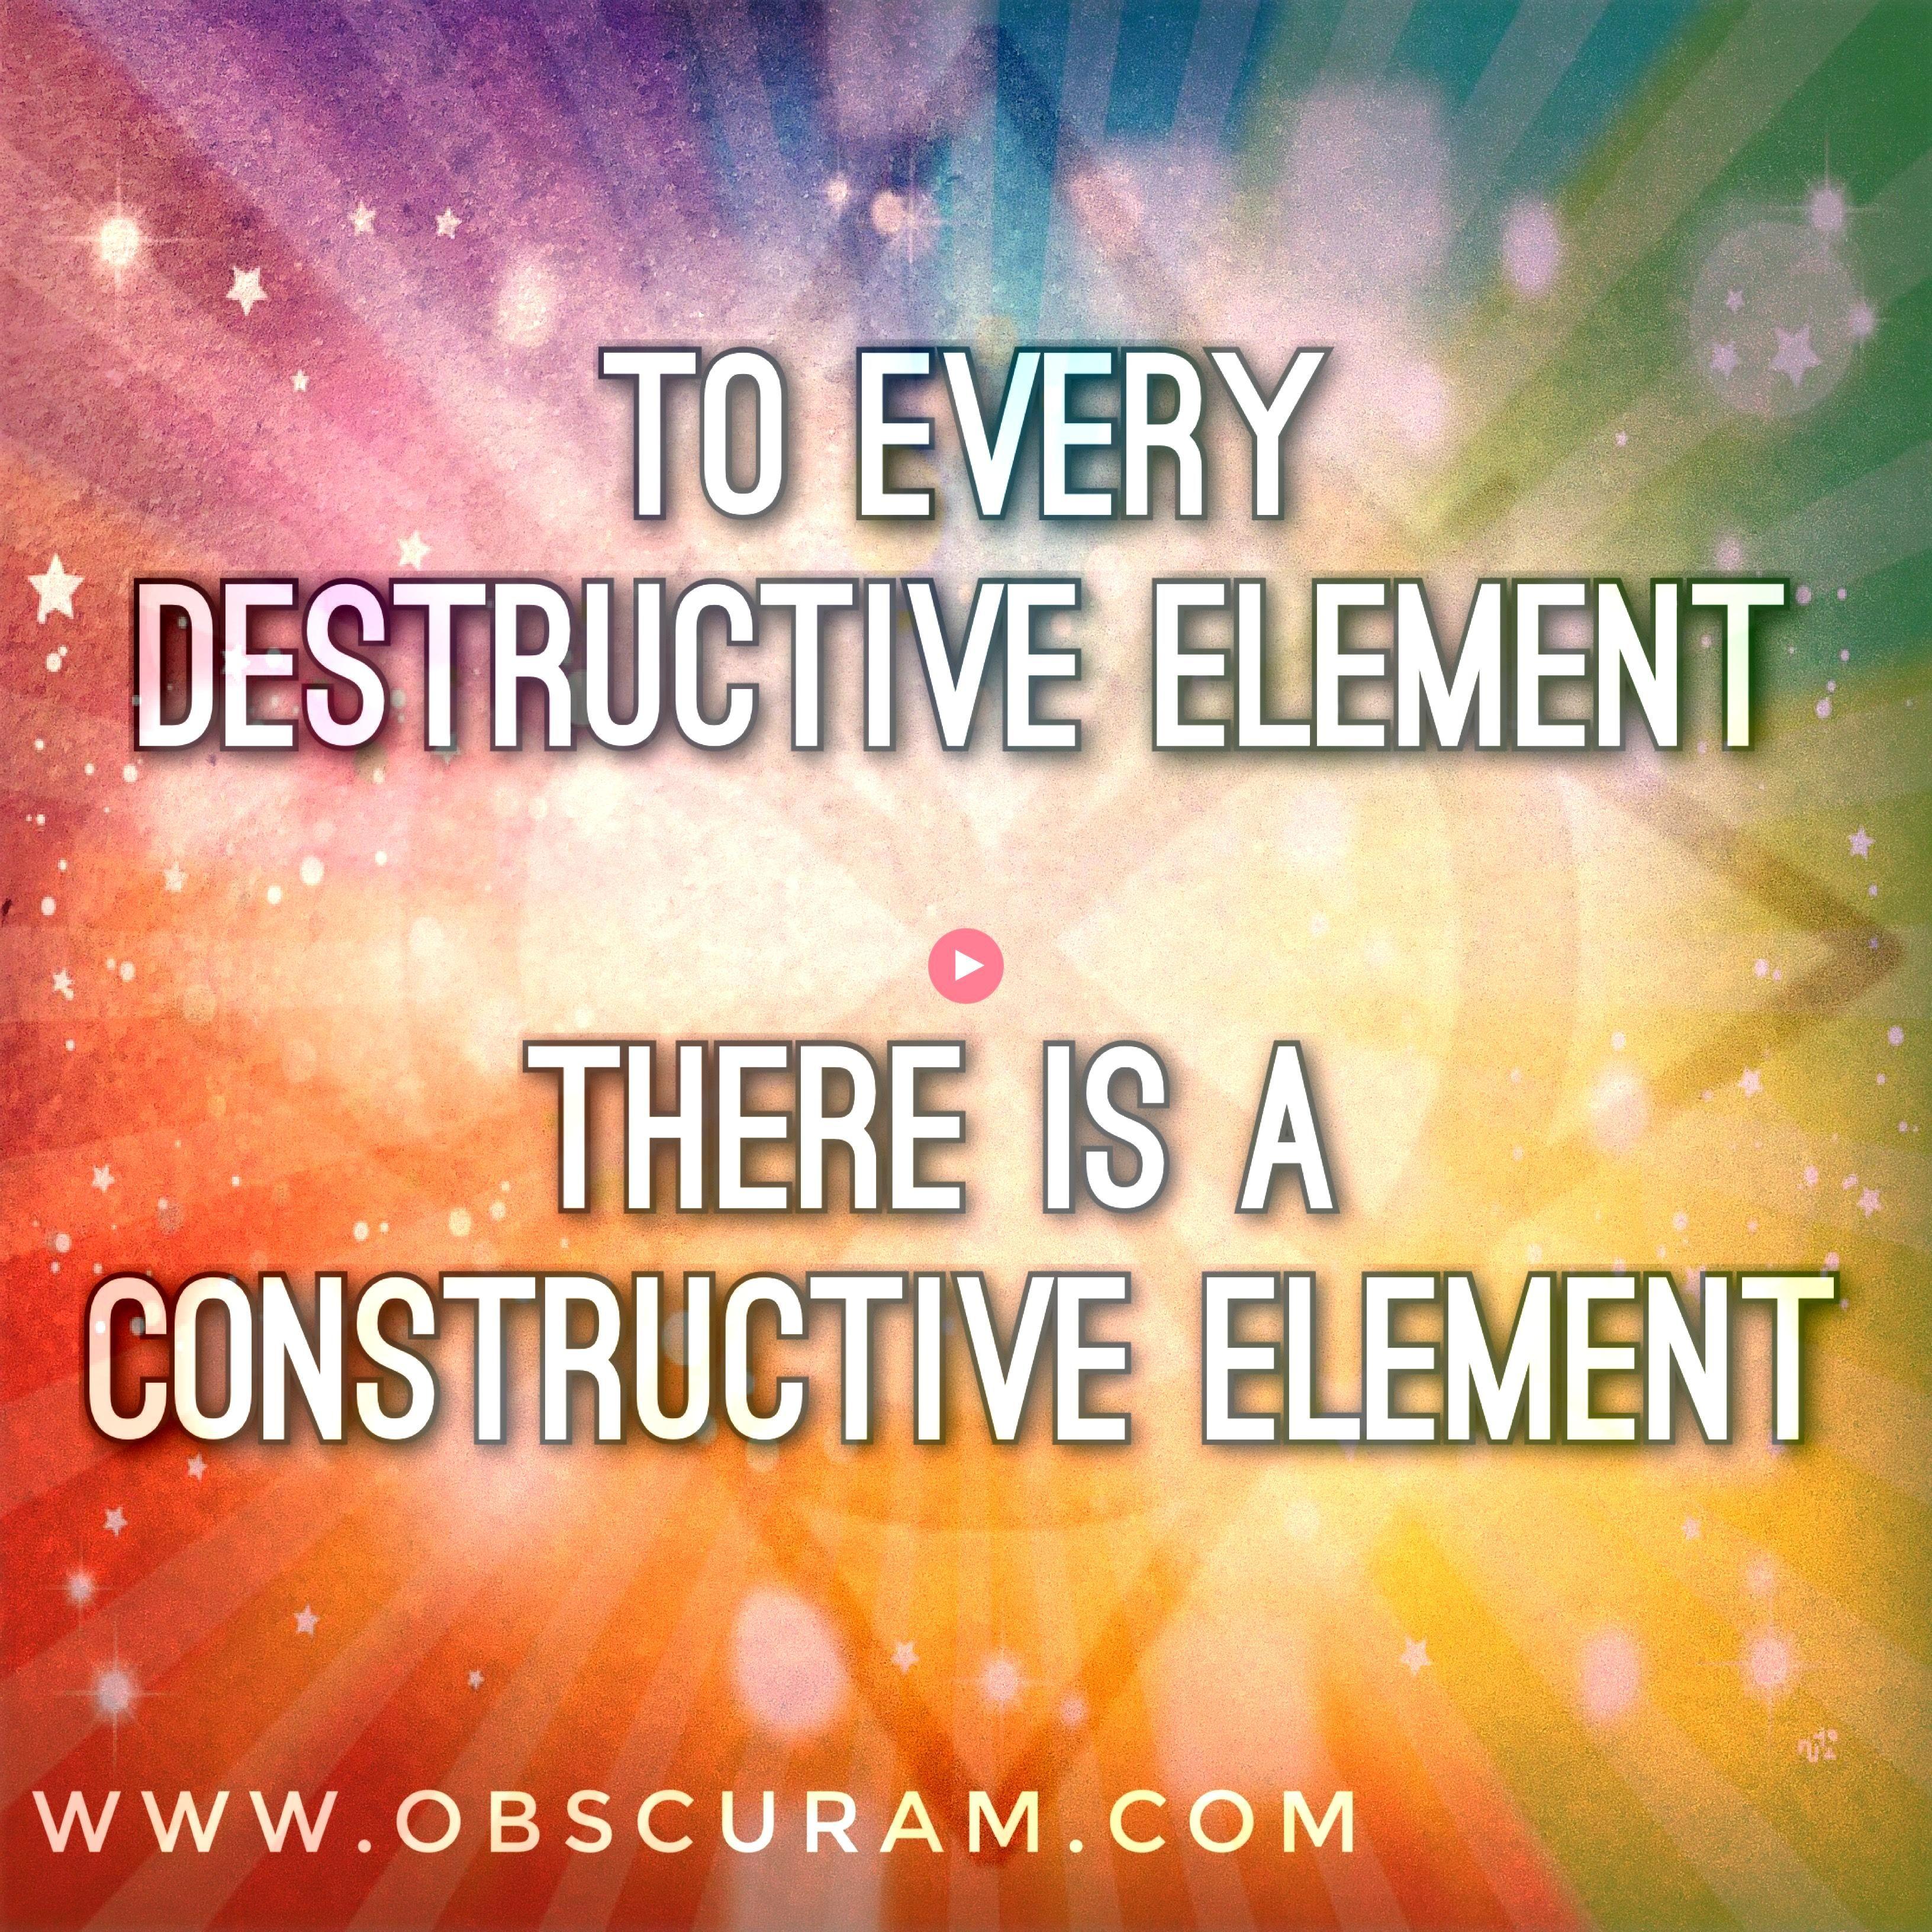 Creation Destruction To every destructive element there is a creative elementTo every destructive element there is a creative element Quick mind clearing technique Stop c...